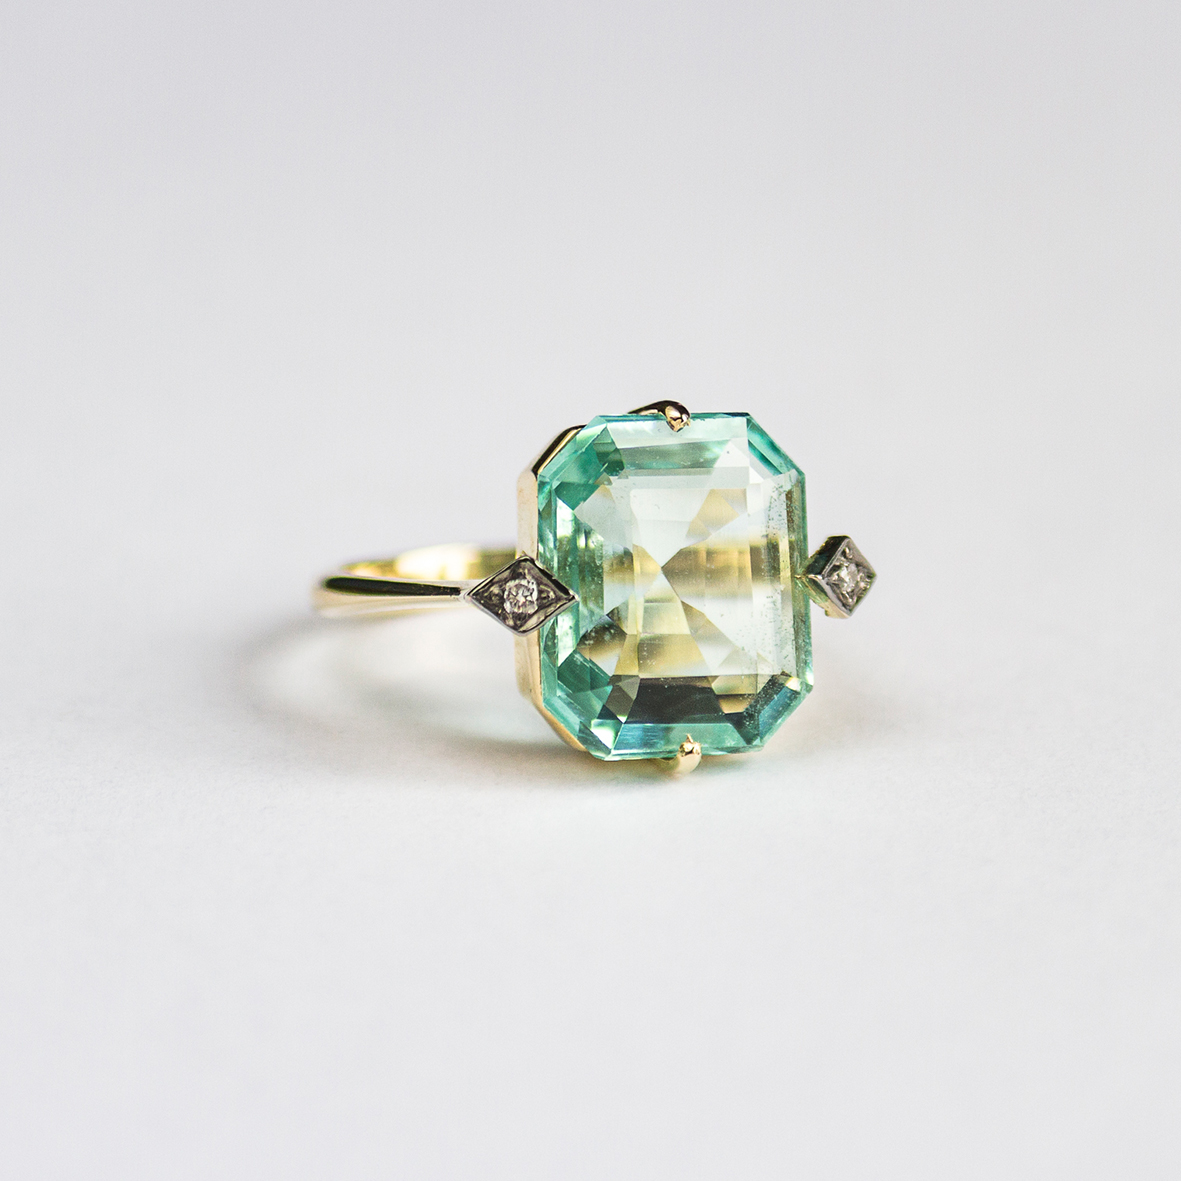 1. OONA_gems of ceylon_ficha1_green aquamarine ring